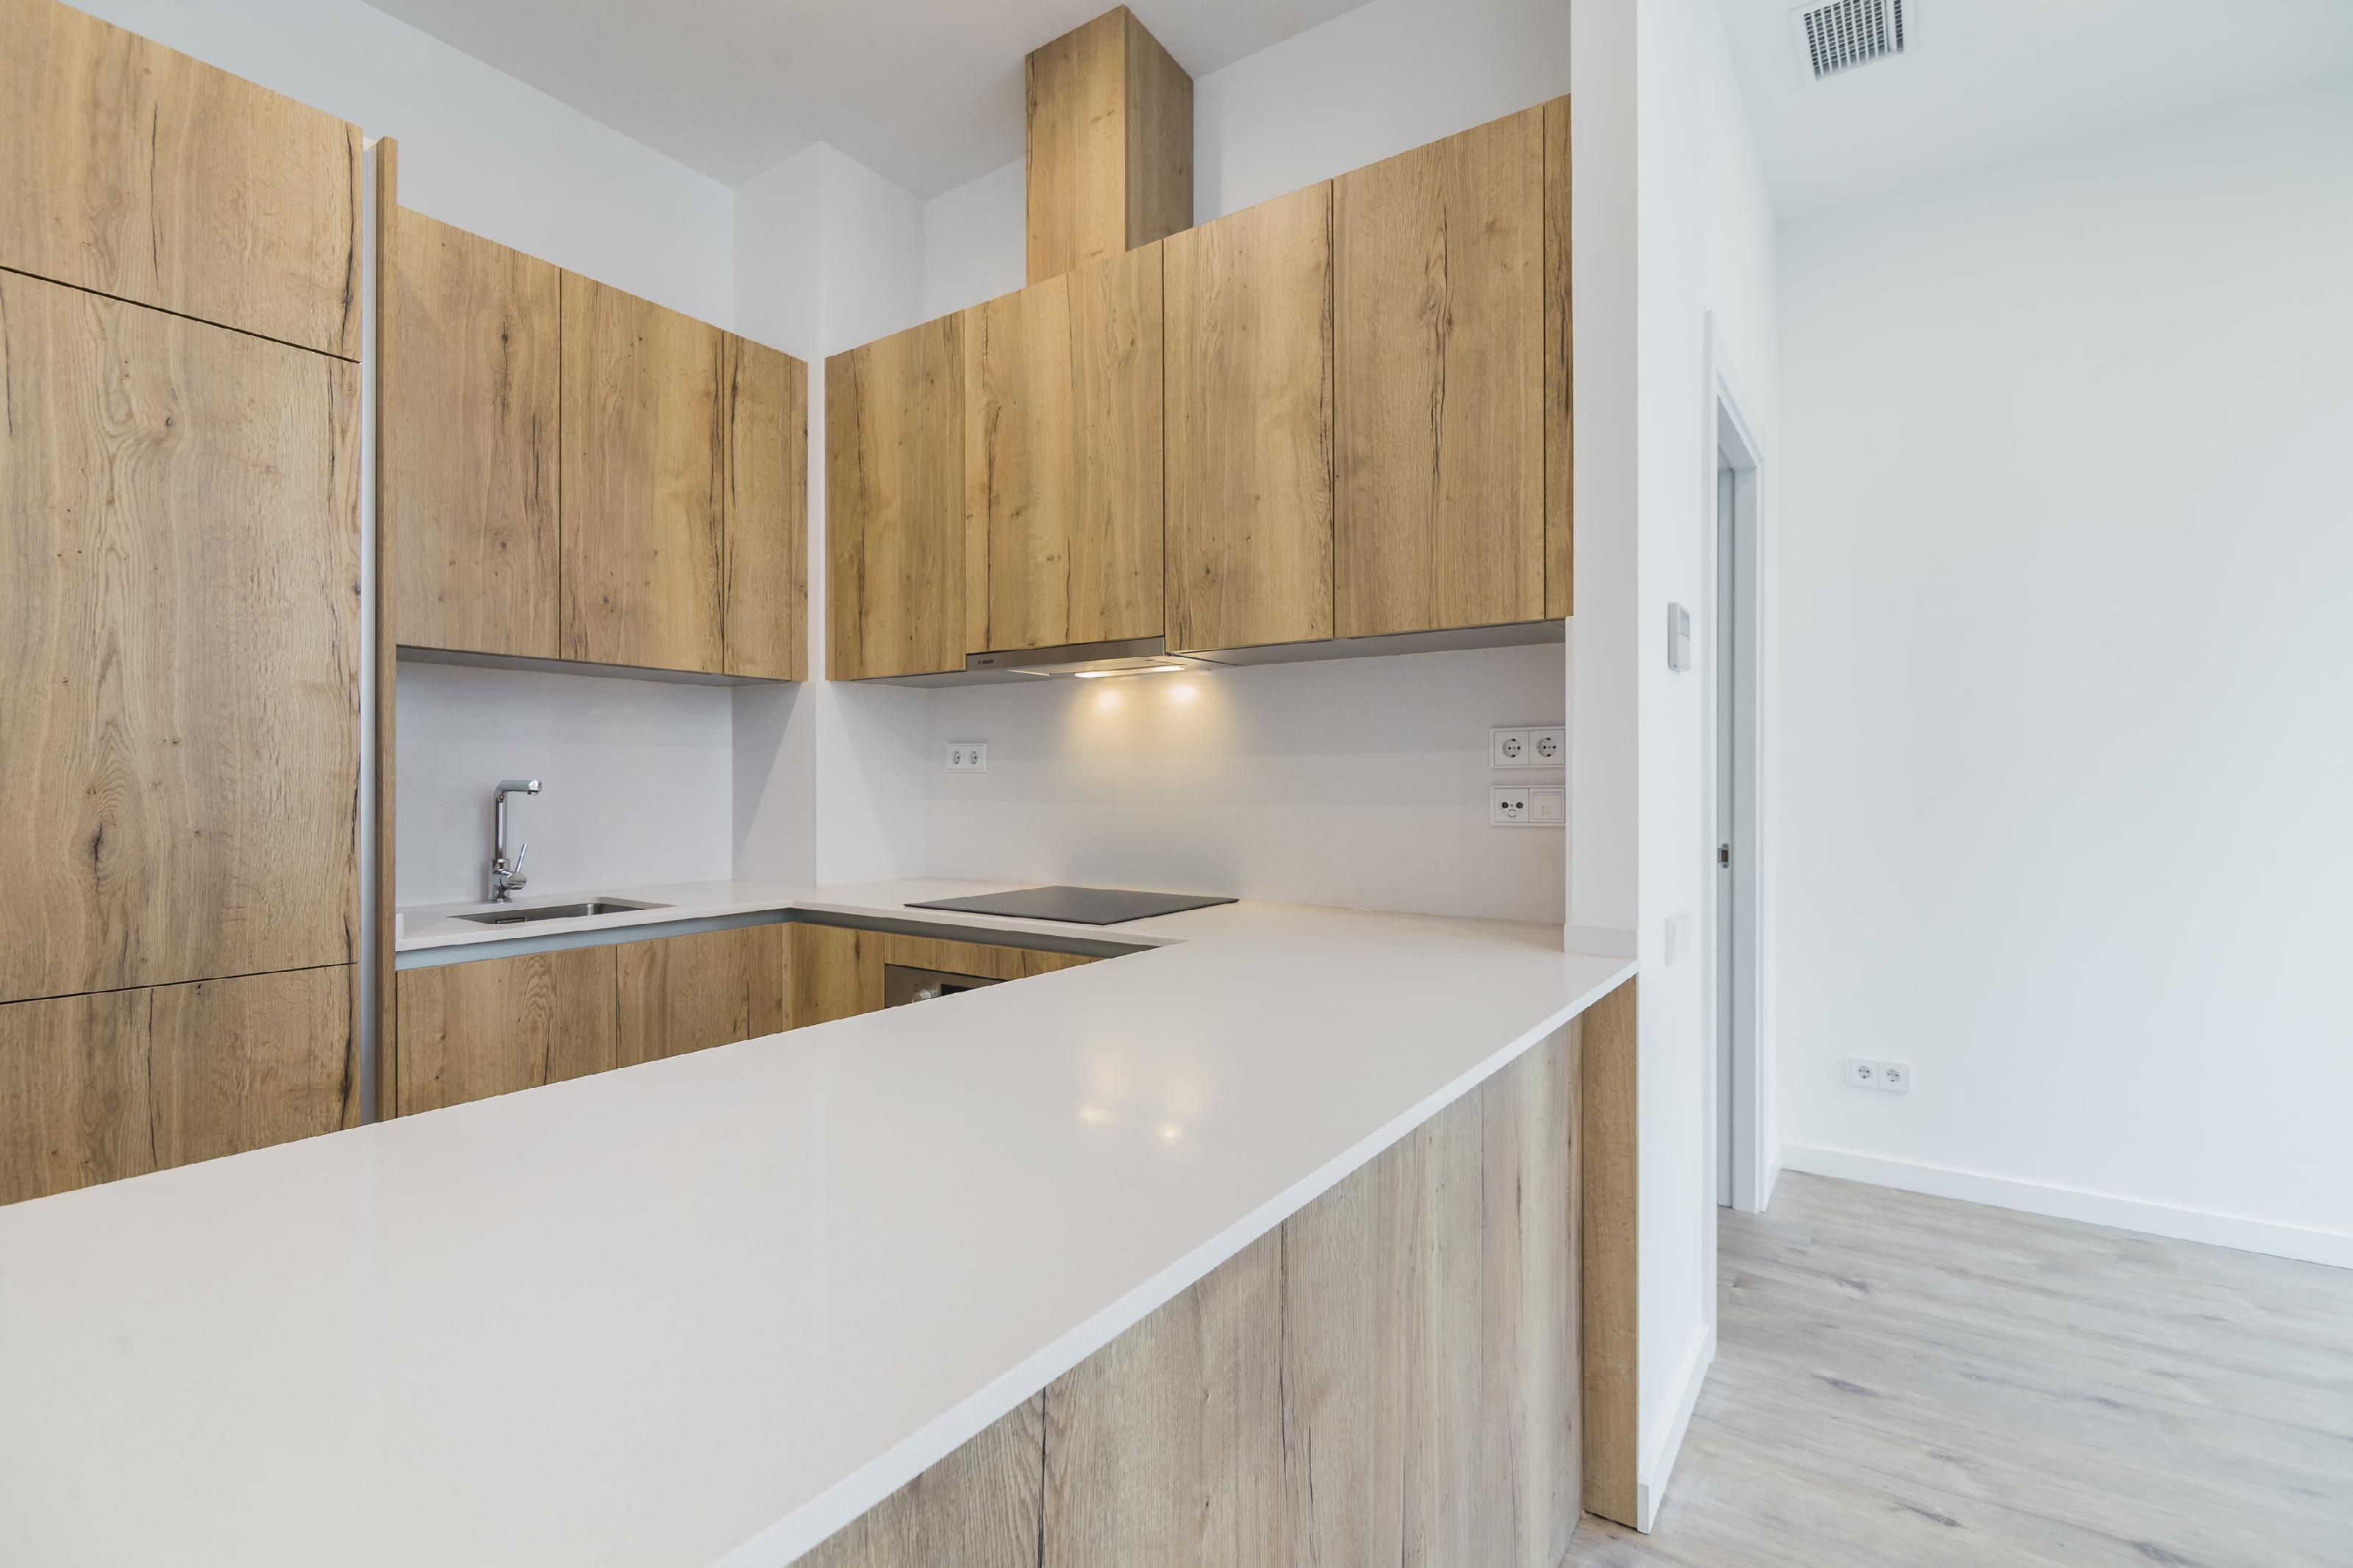 249857 Flat for sale in Eixample, Nova Esquerra Eixample 6